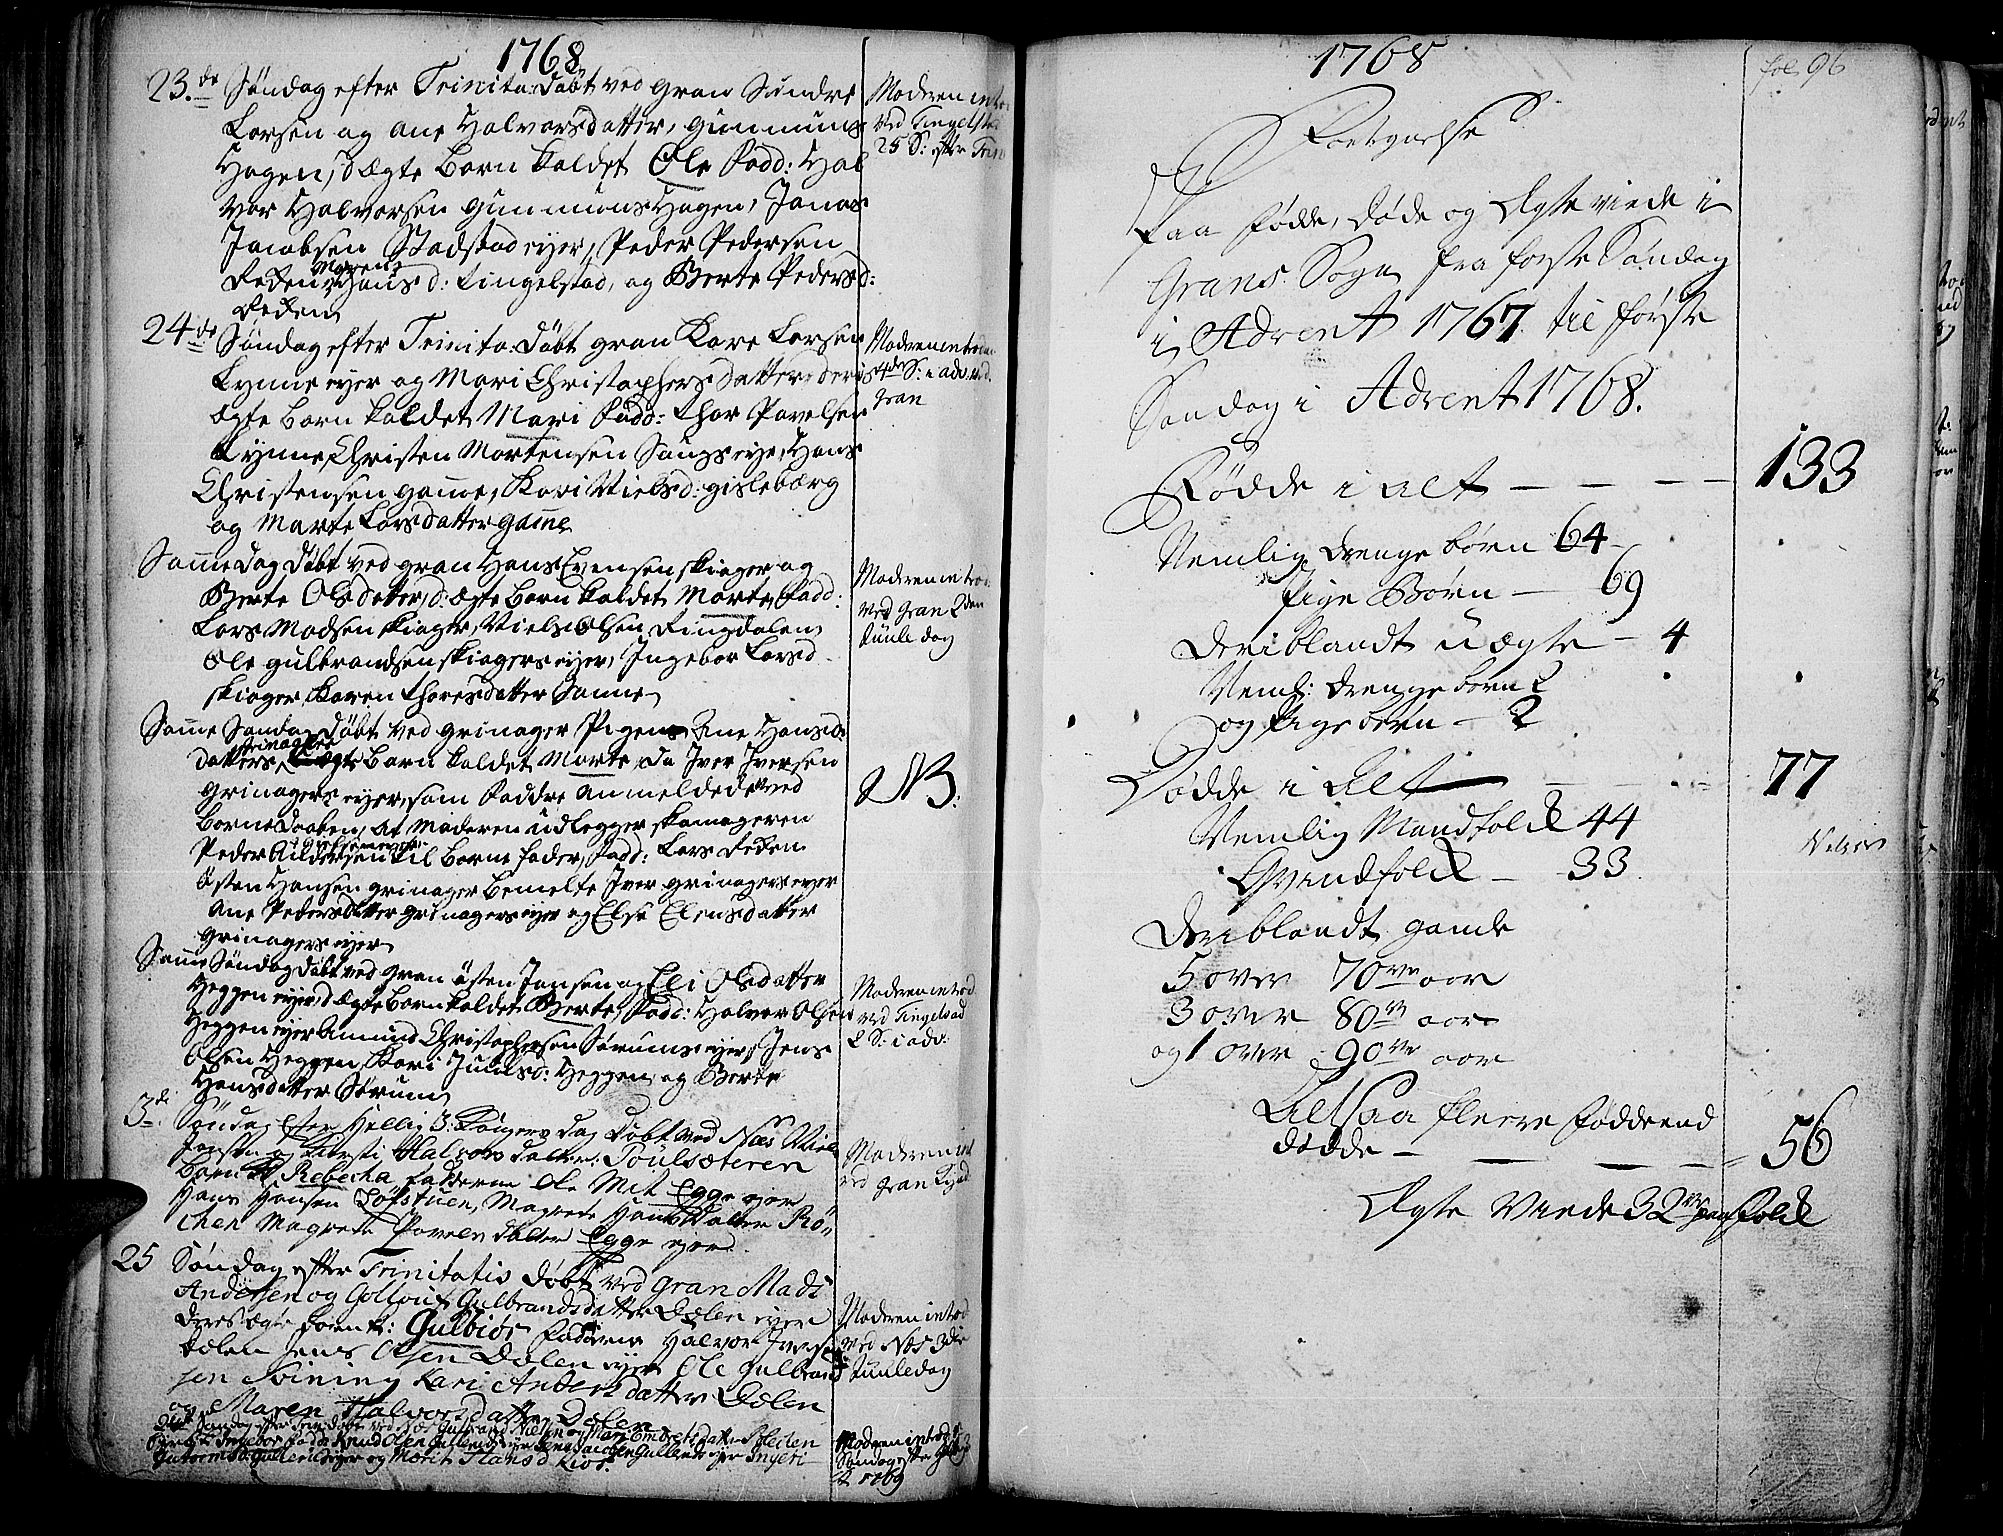 SAH, Gran prestekontor, Ministerialbok nr. 4, 1759-1775, s. 96